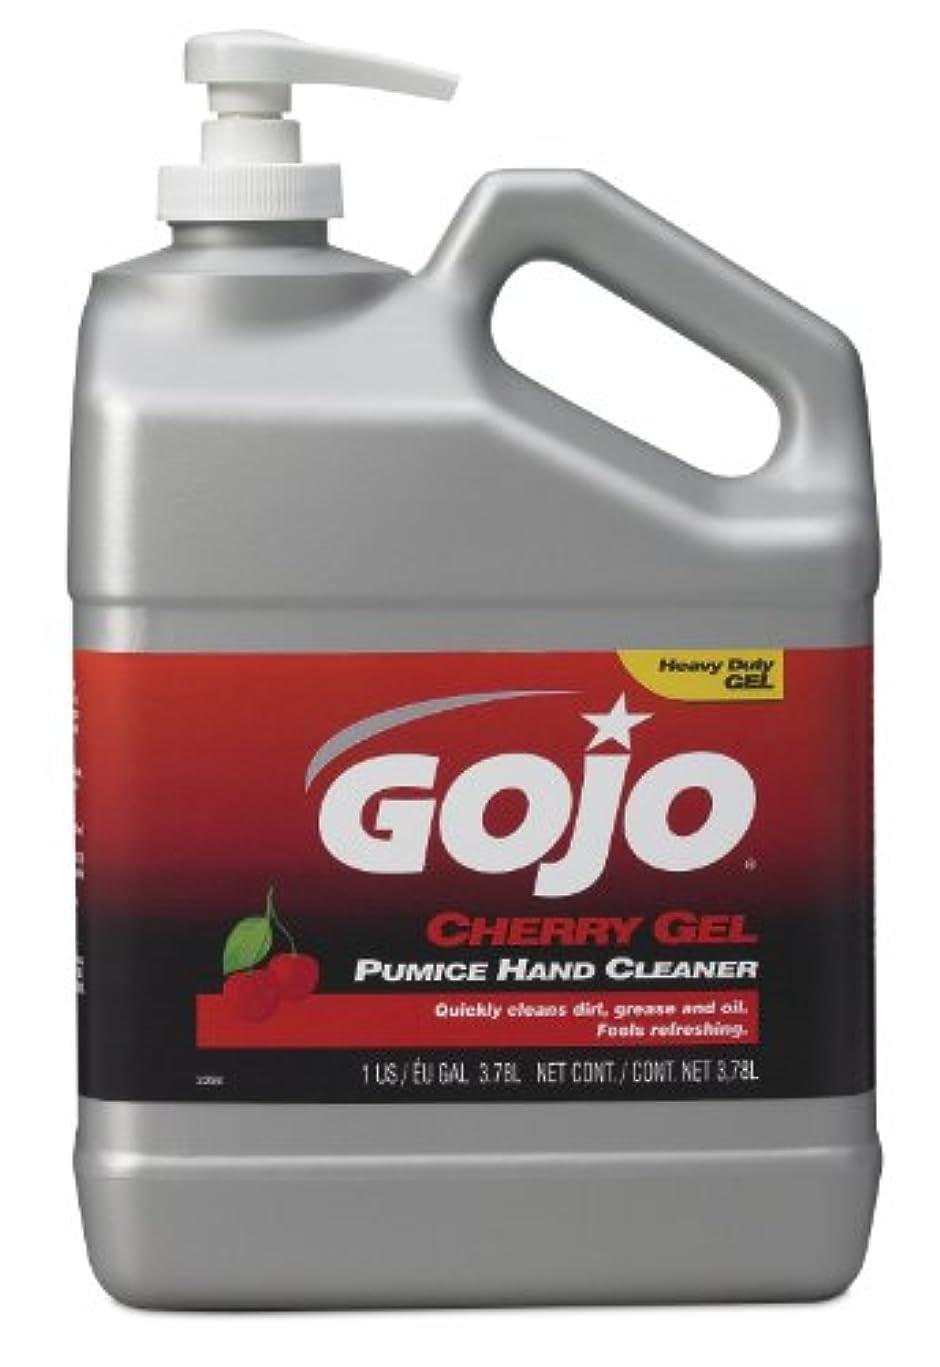 GOJO 2358 – 02チェリージェル軽石ハンドクリーナーポンプボトル – 1ガロン、( Pack of 2 )